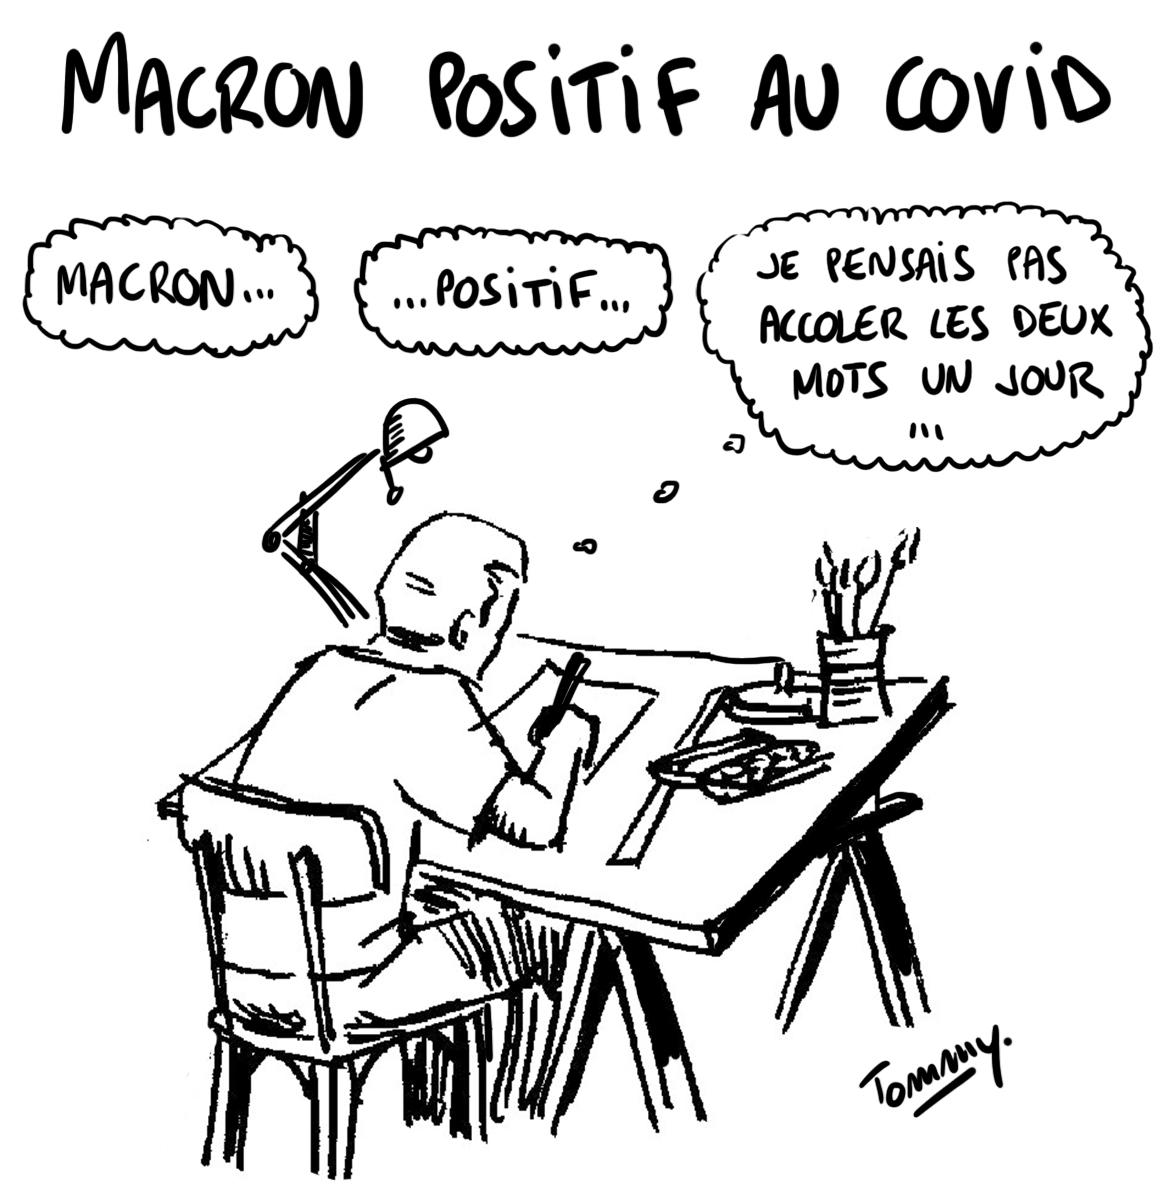 Macron positif